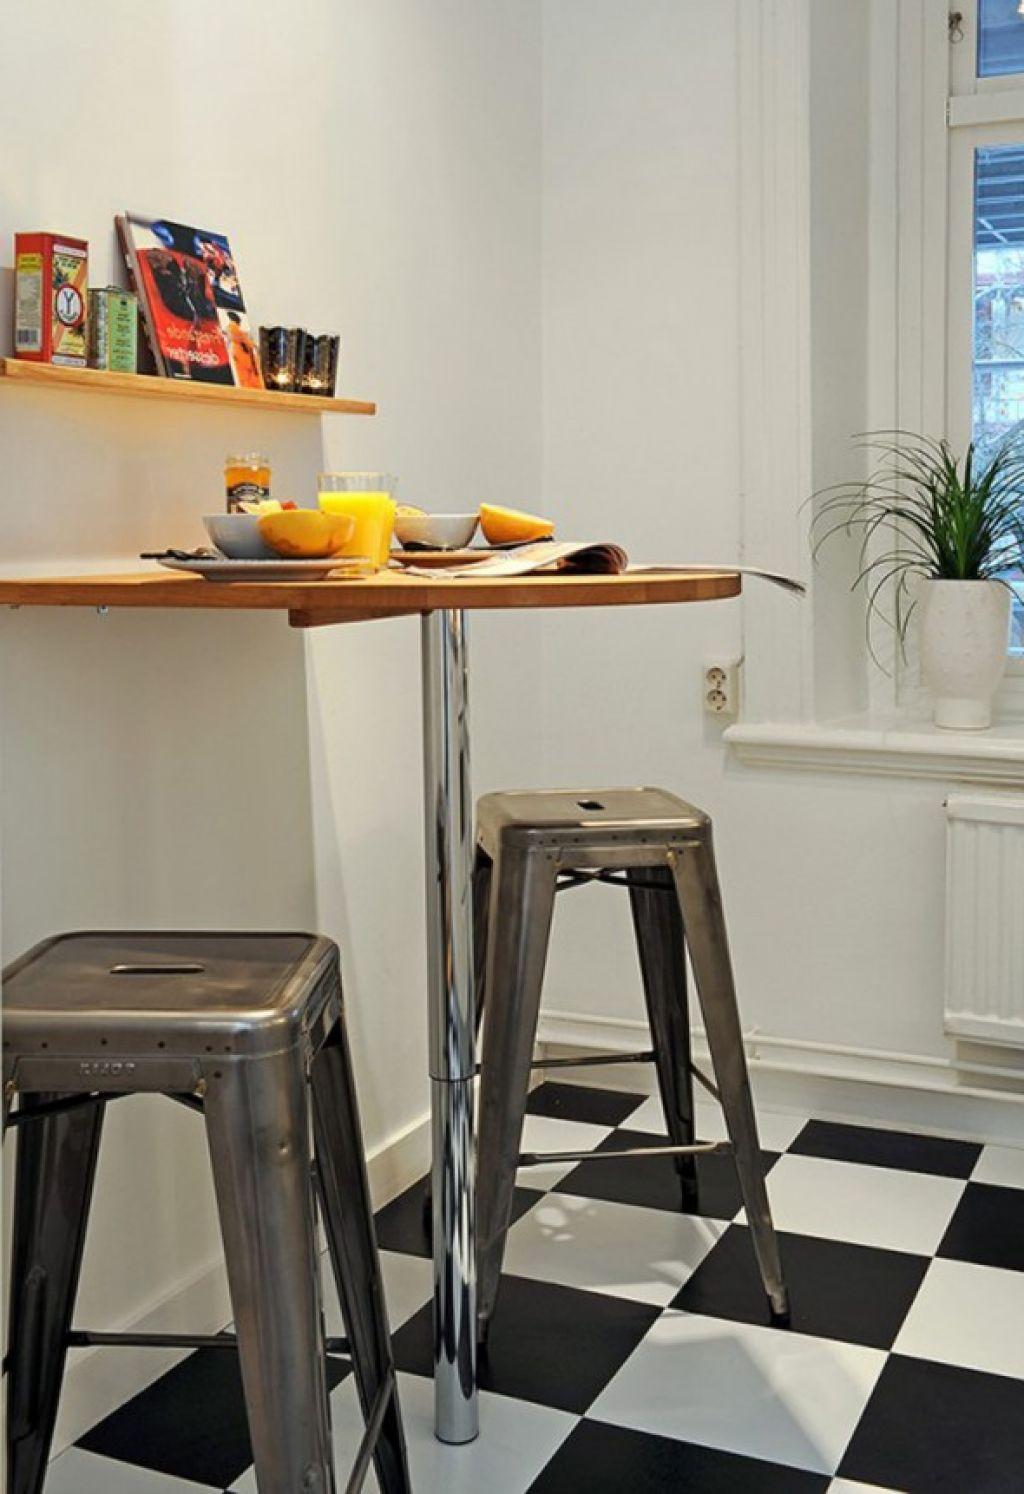 Kmart kitchen tables photo - 2